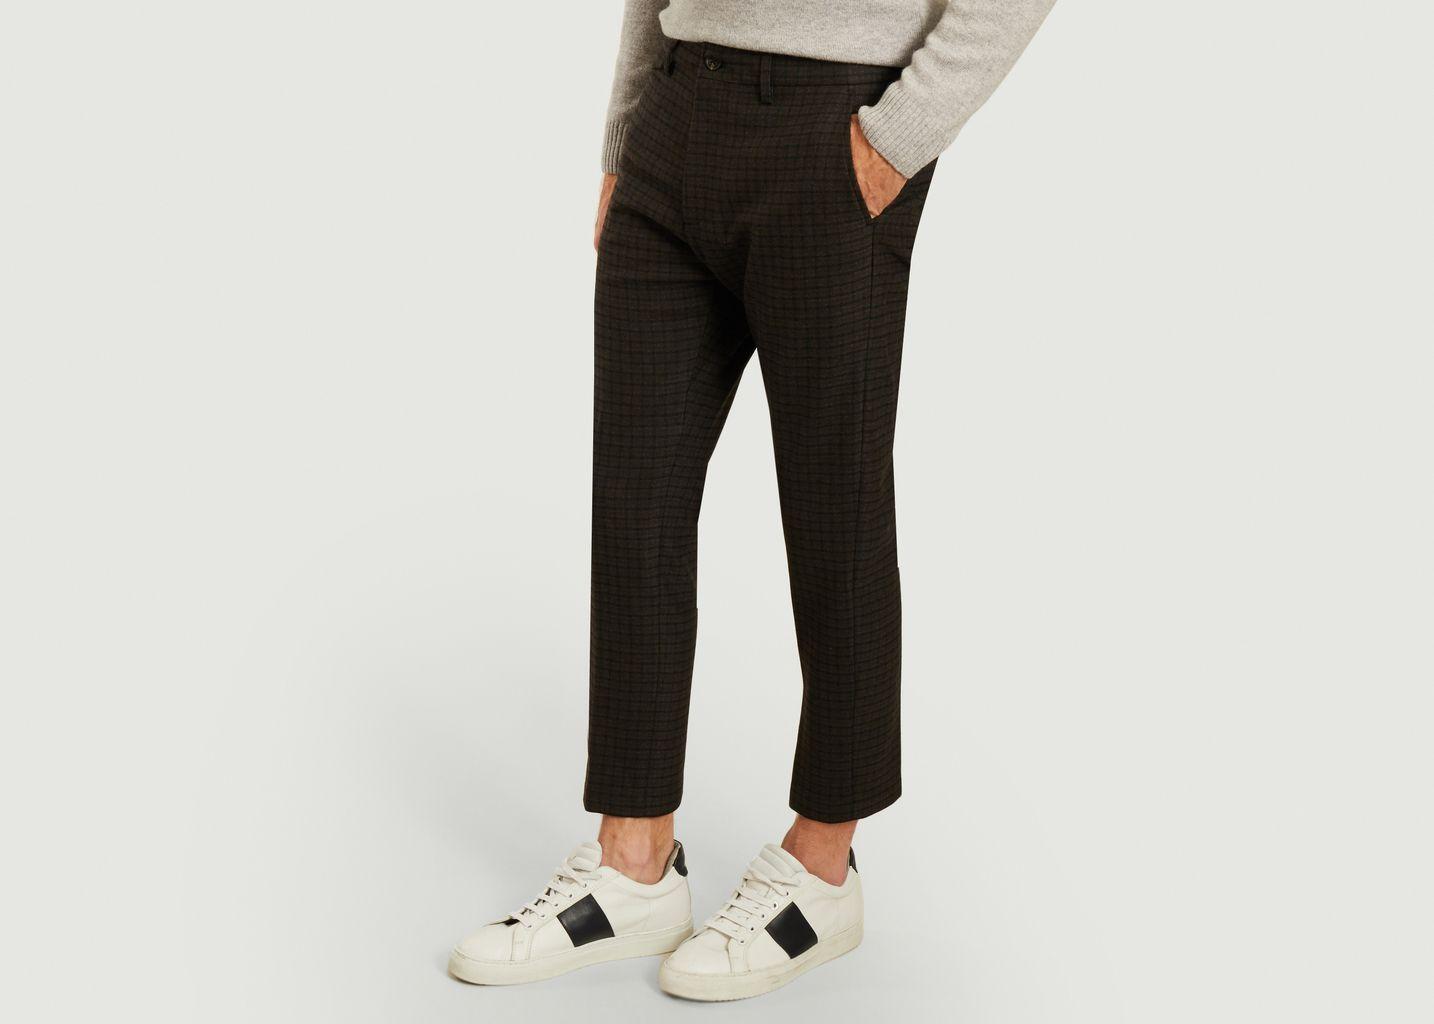 Pantalon fuseau Atelier - Closed